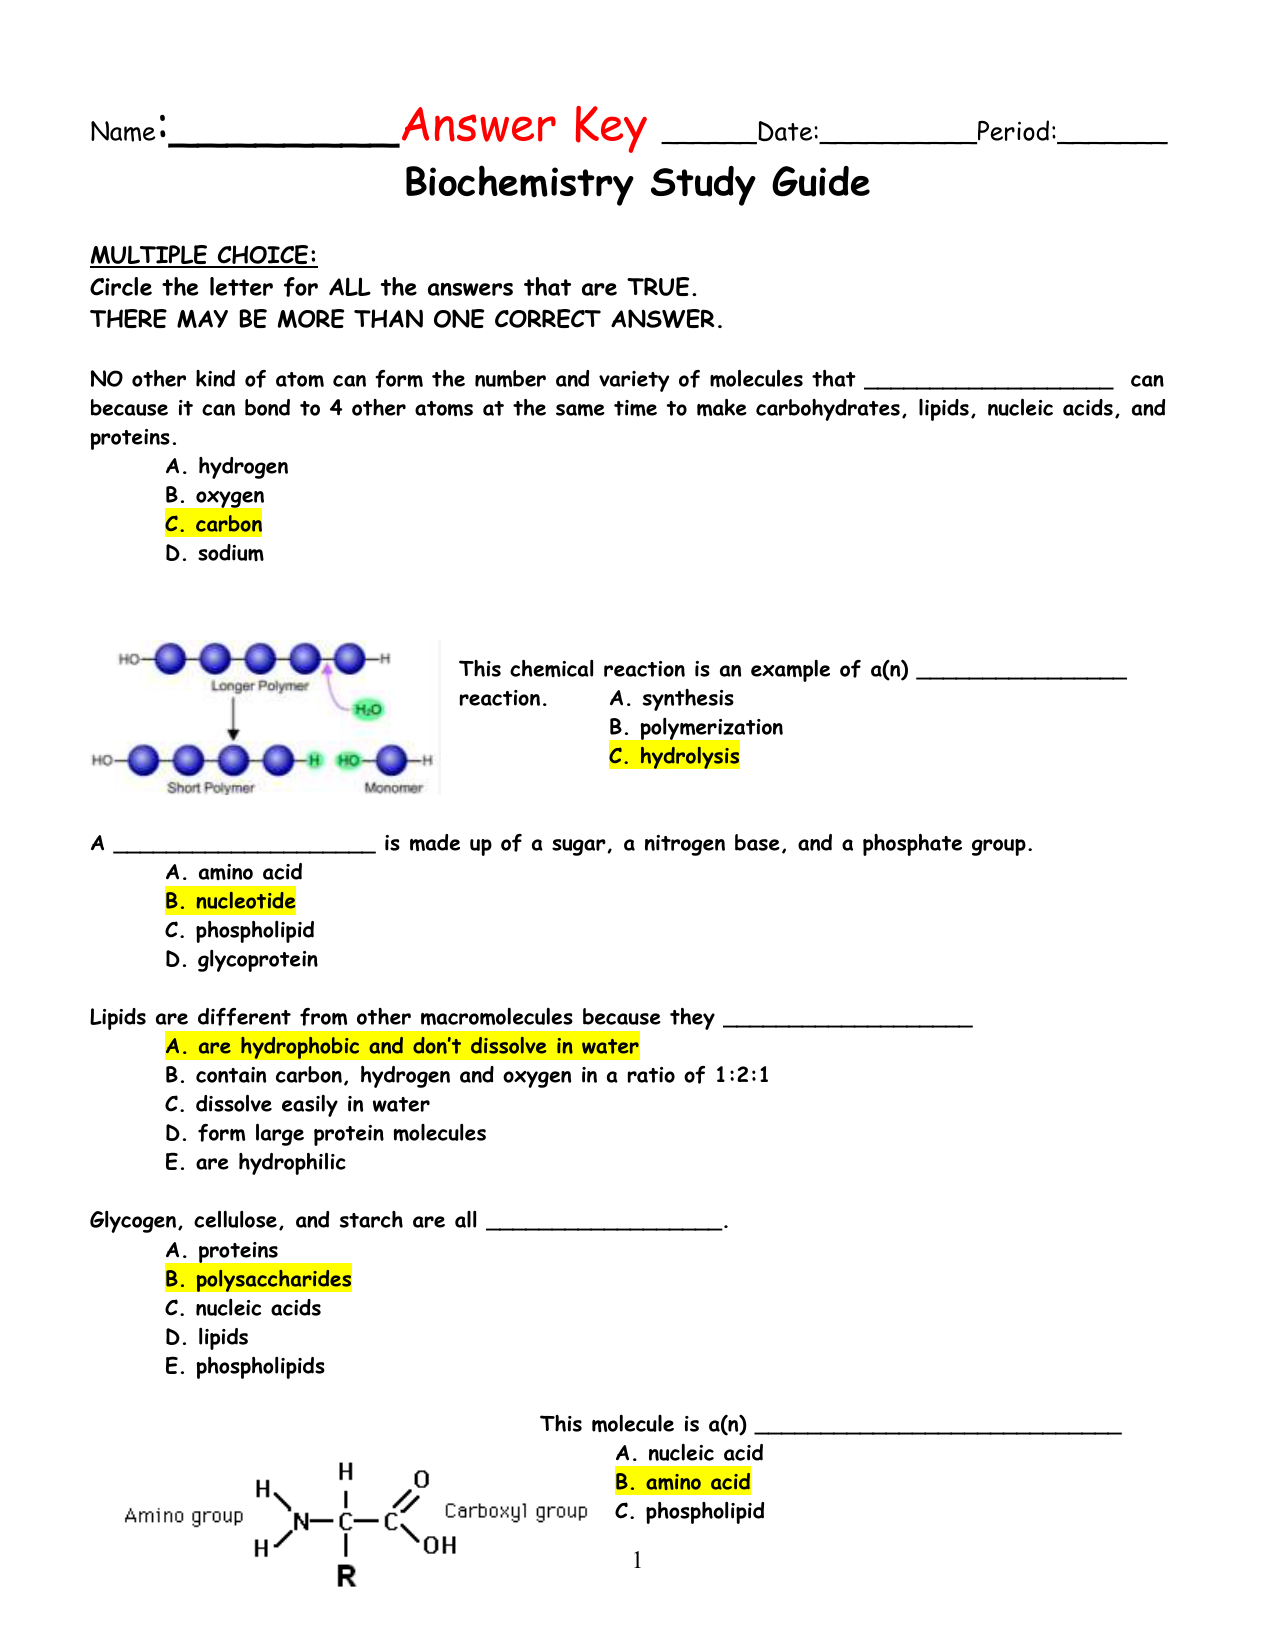 Answer Key for Biochemistry Study Guide